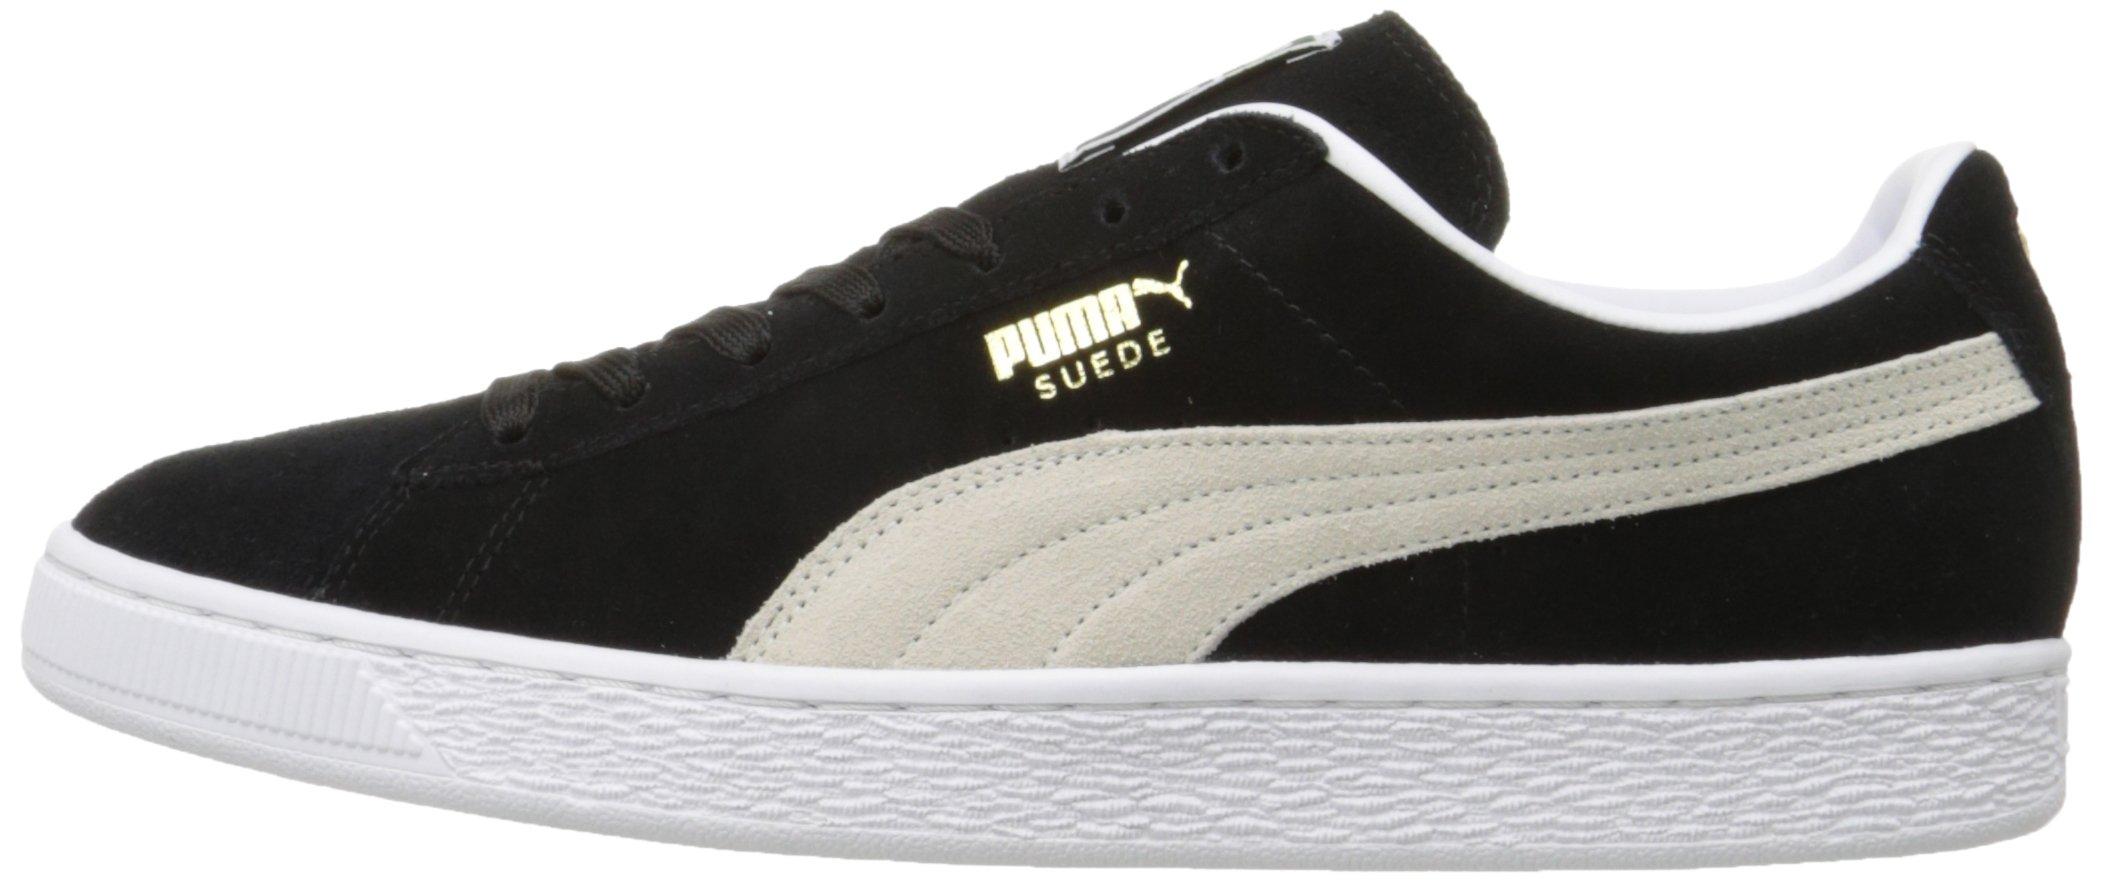 PUMA Suede Classic Sneaker,Black/White,9.5 M US Men's by PUMA (Image #5)